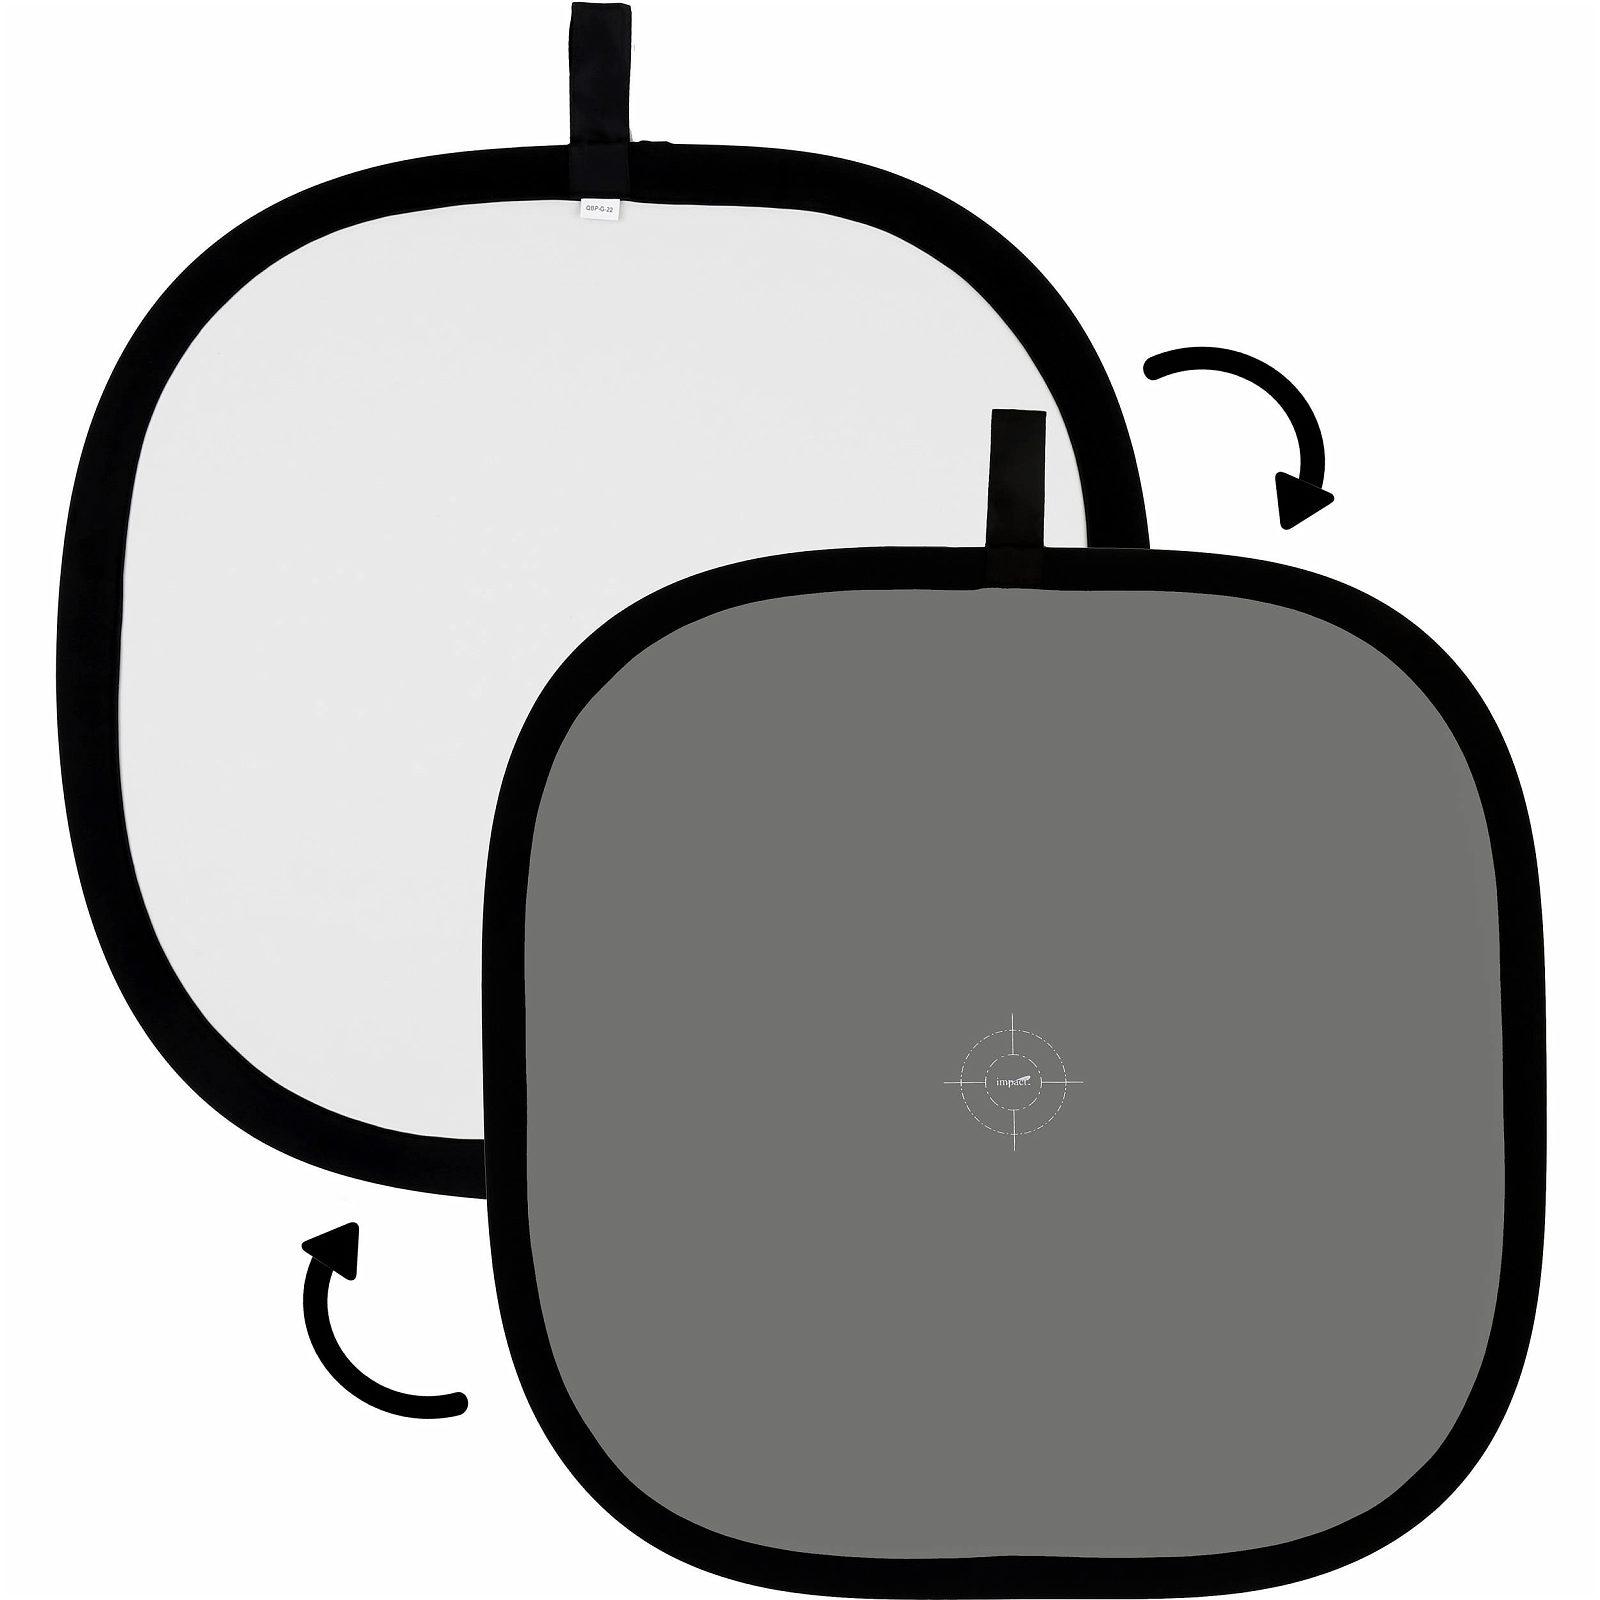 Oboustranná tabulka s bílým a šedým povrchem